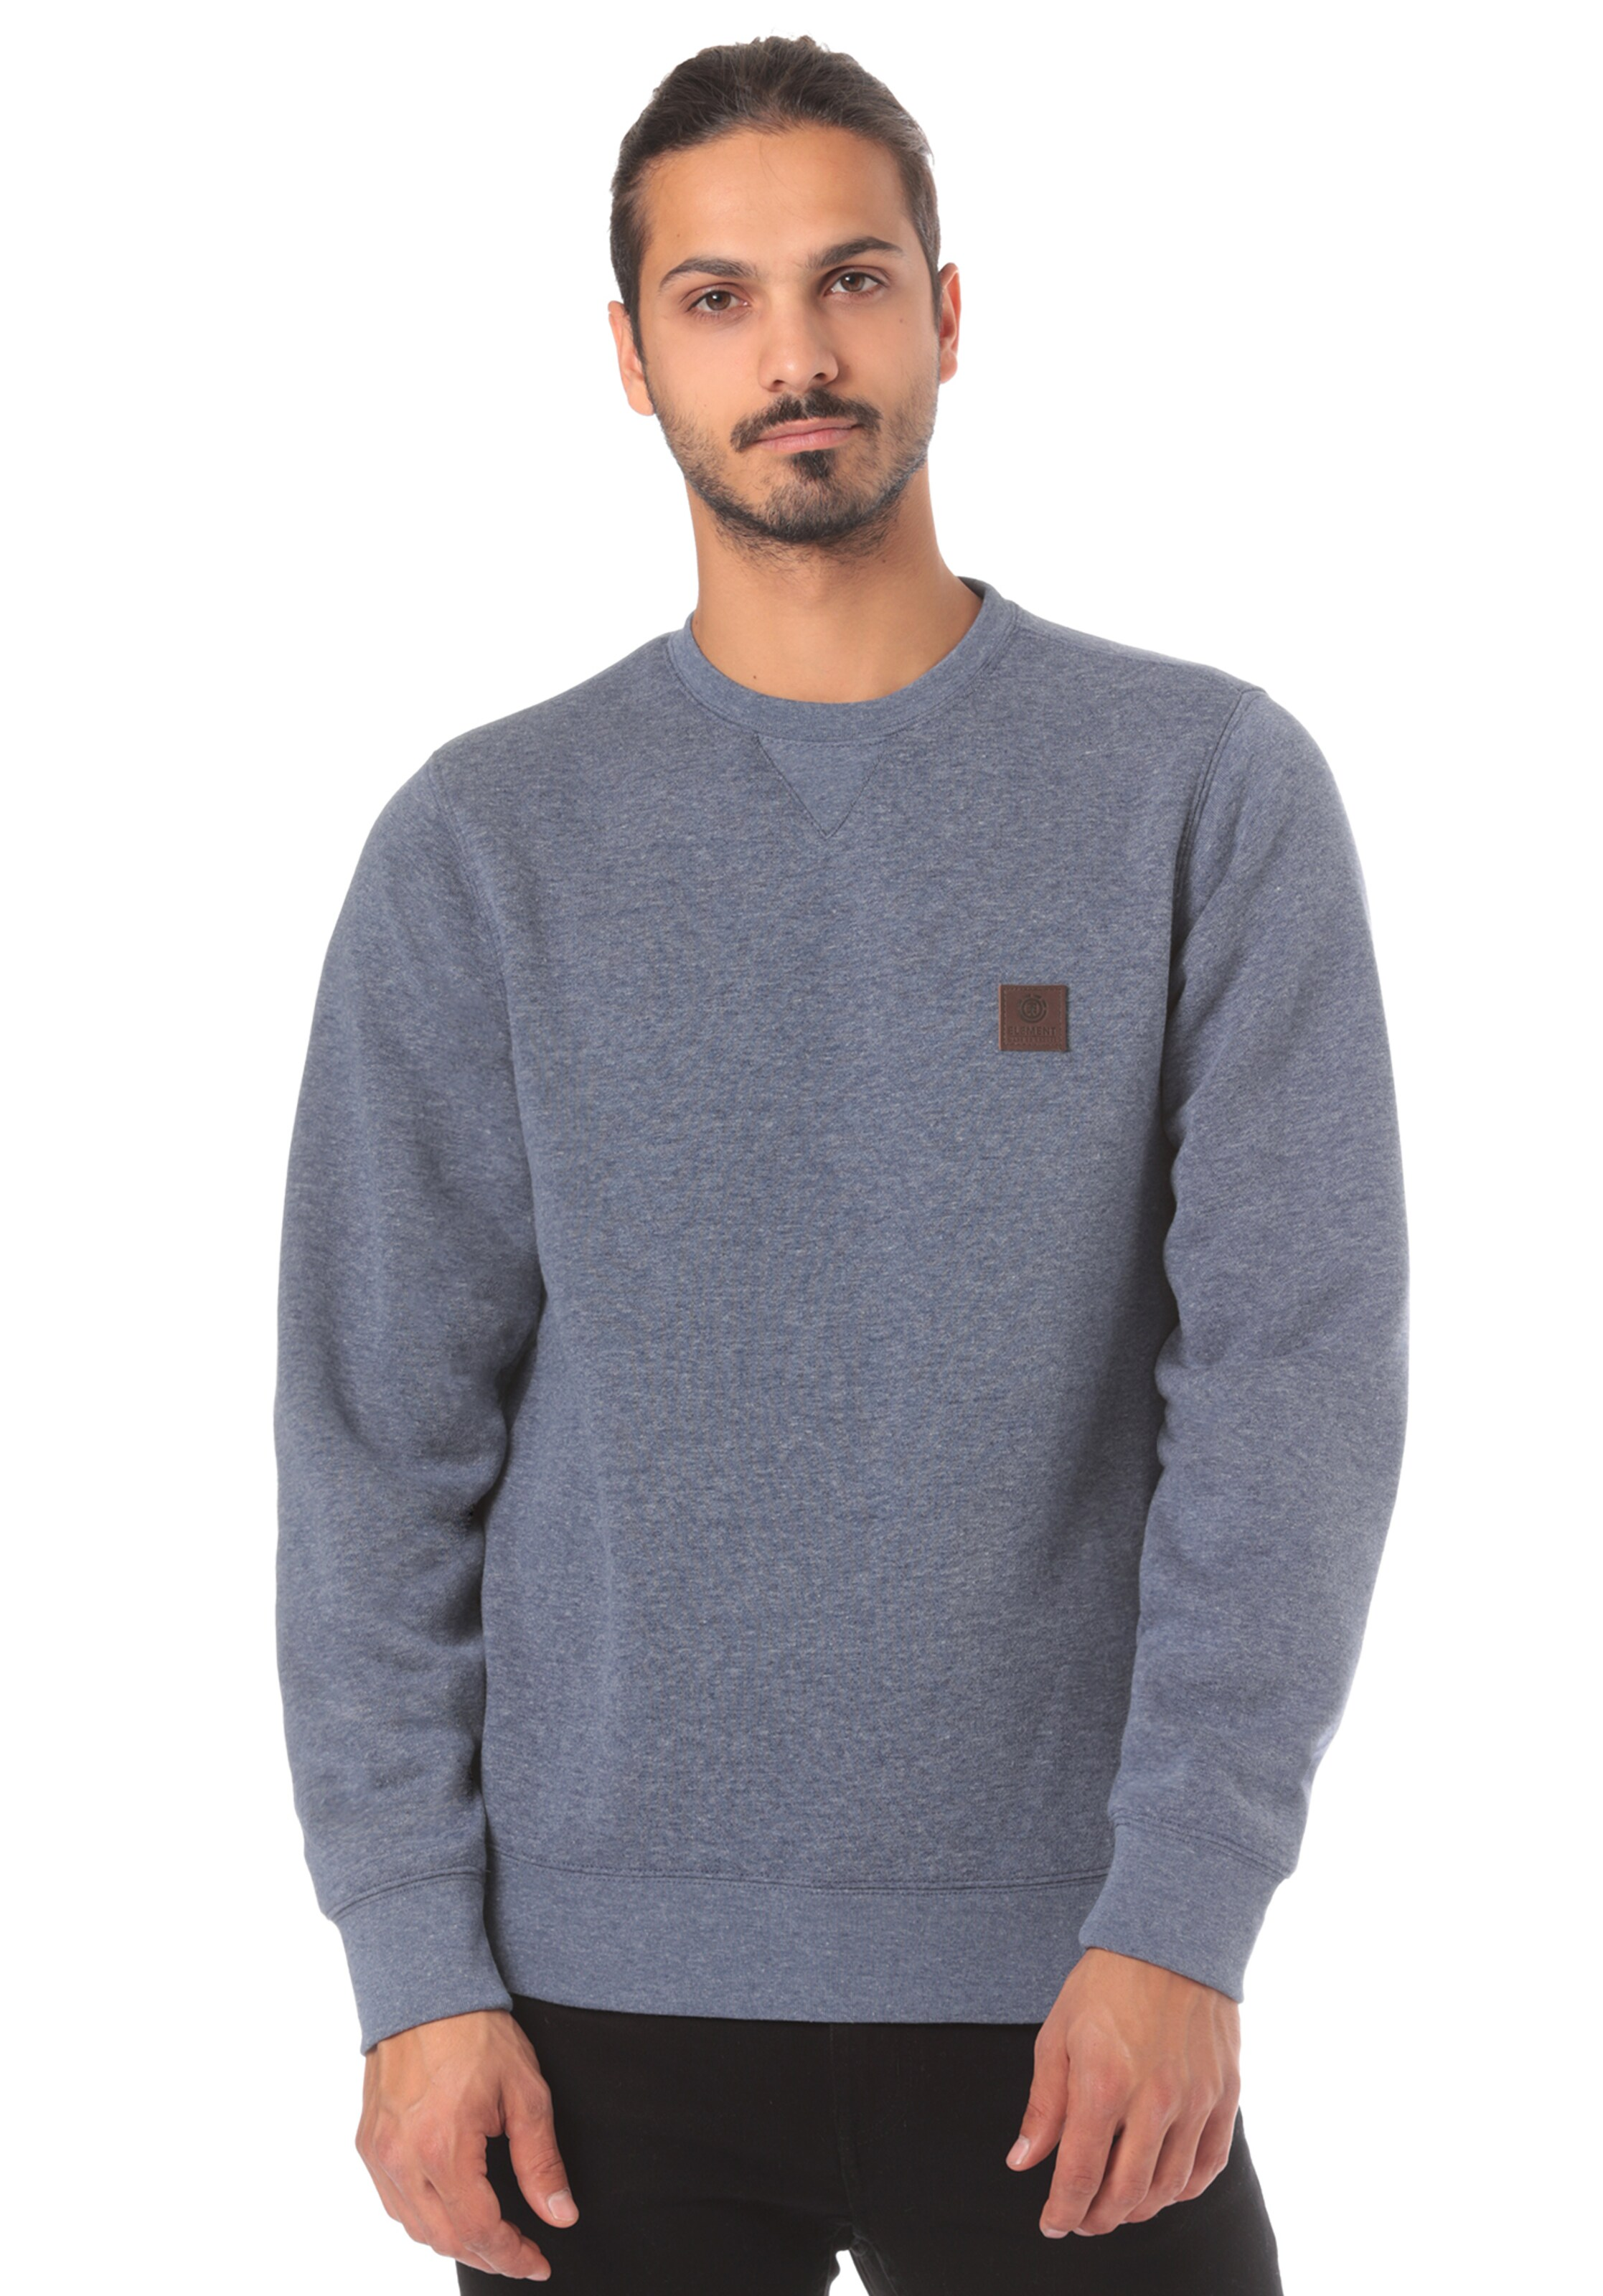 'heavy In Element Blau Sweatshirt Crew' cSA54RLq3j